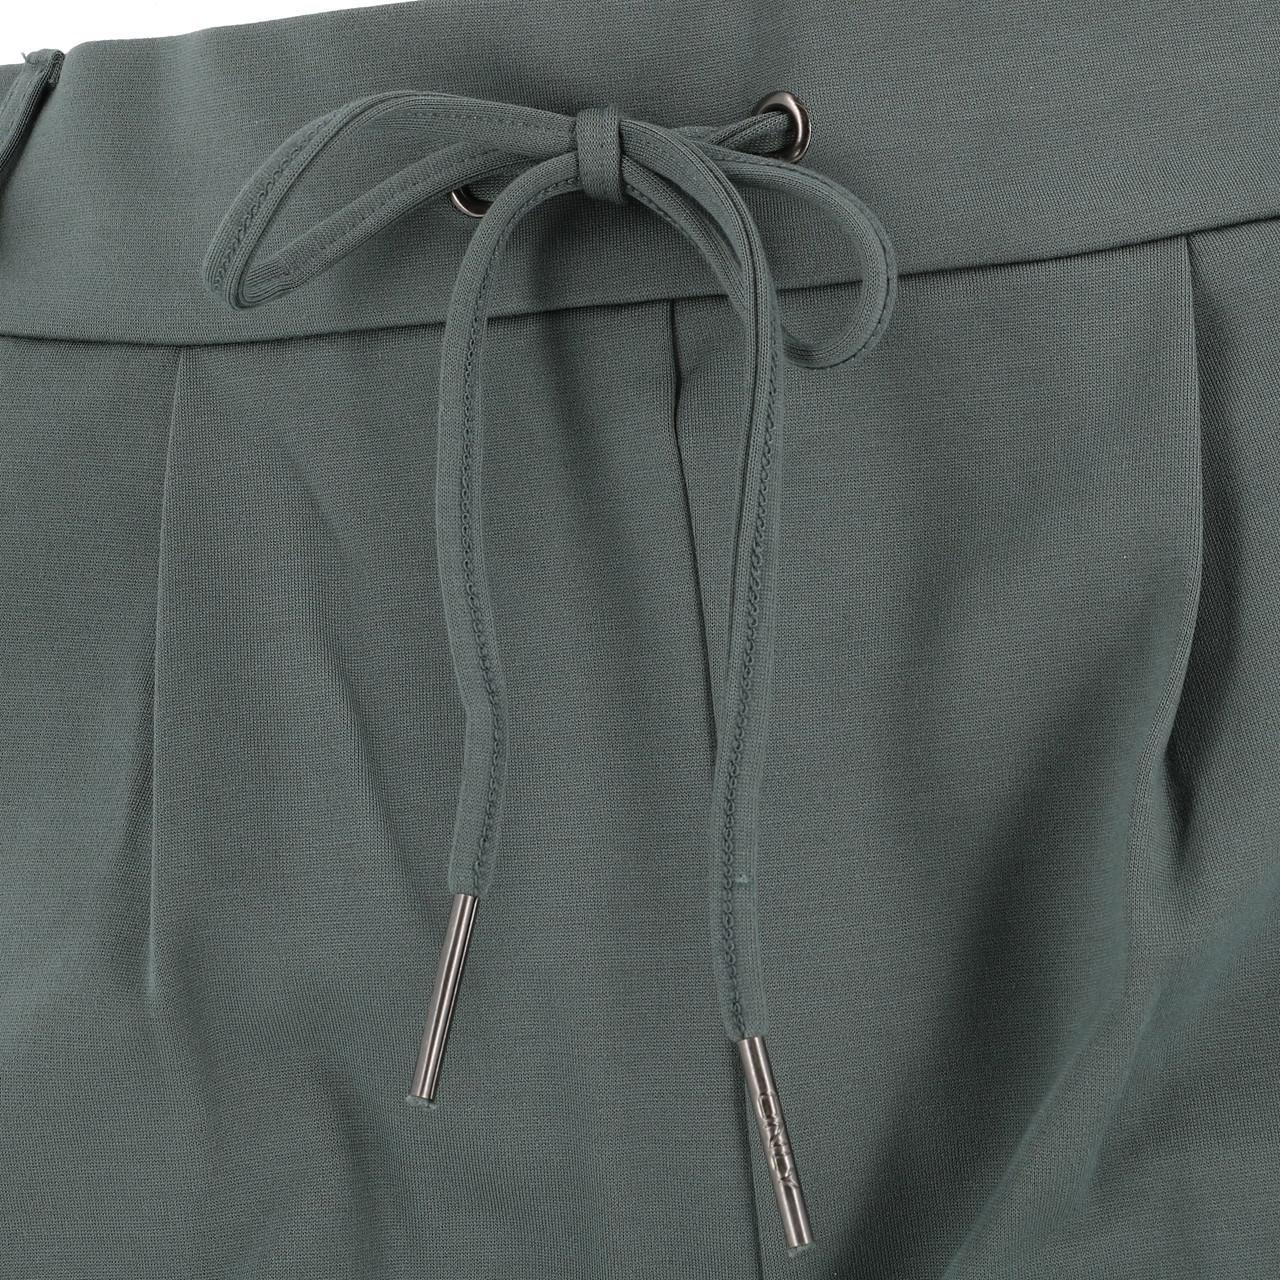 Bermuda-Shorts-Only-Poptrash-Lt-Khaki-Shorts-Green-18701-New thumbnail 4